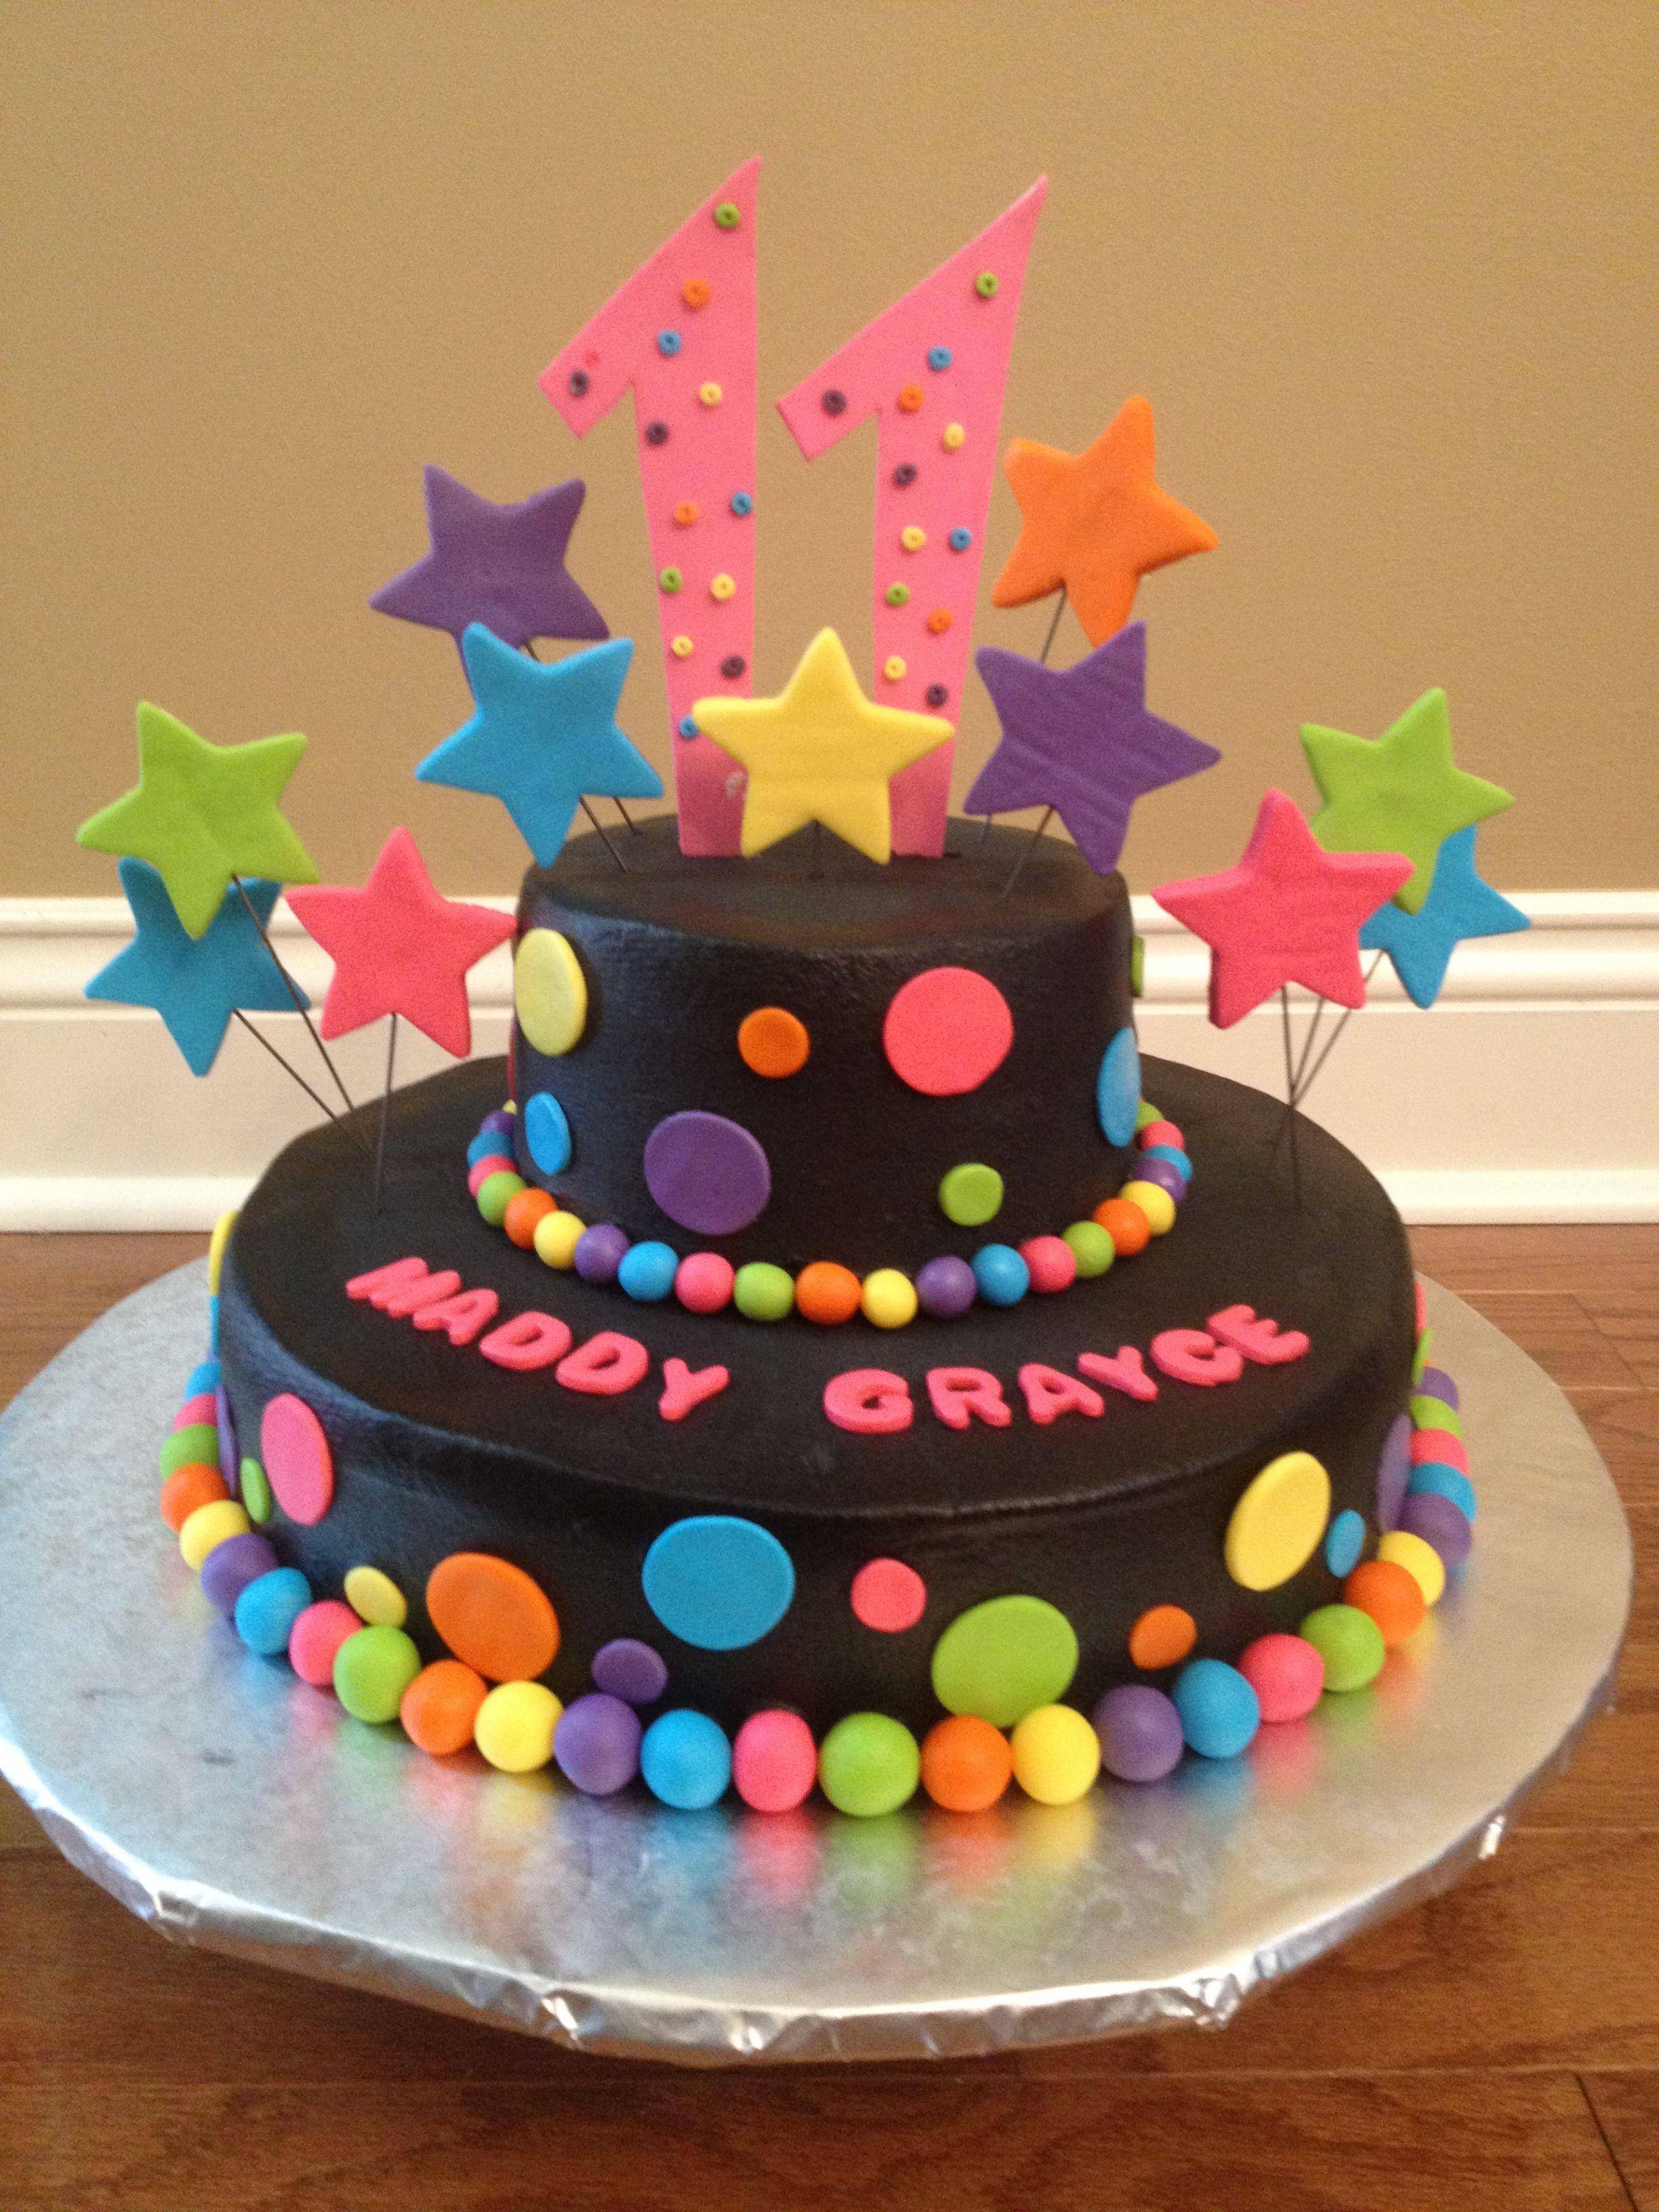 Admirable Neon Birthday Cake Neon Birthday Cakes Neon Birthday Neon Cakes Birthday Cards Printable Riciscafe Filternl